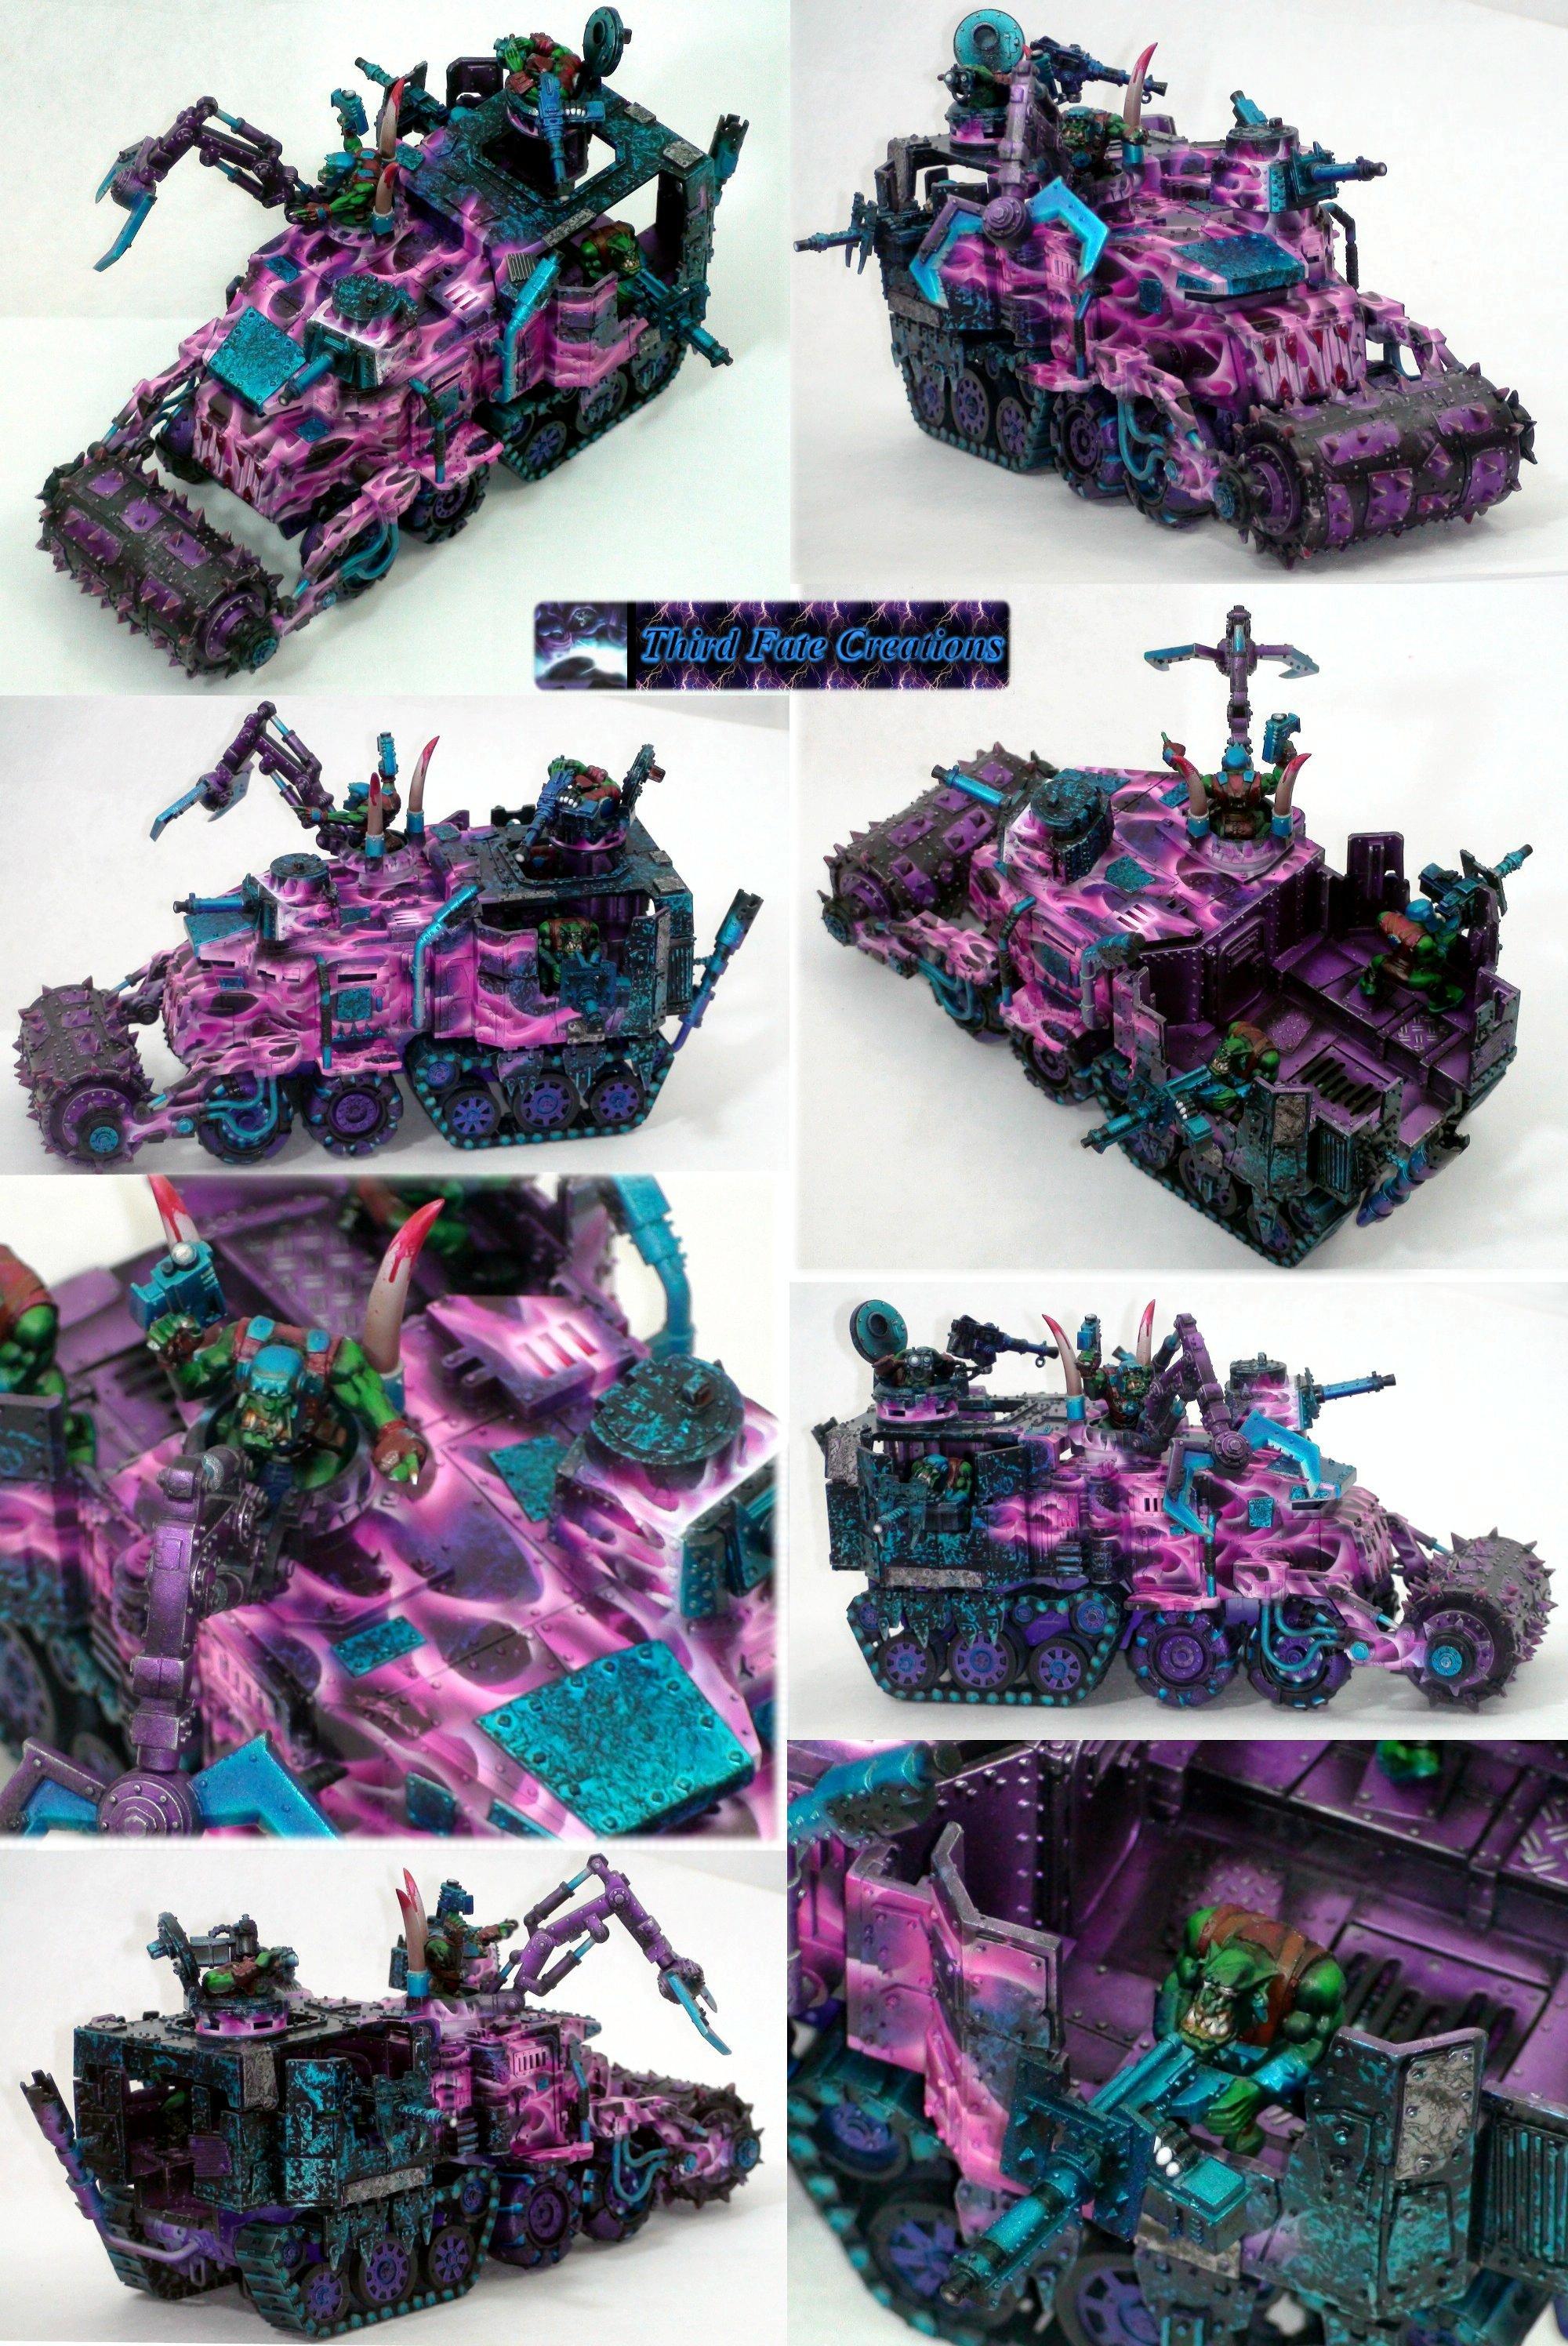 Airbrush, Battlewagon, Orks, Pink